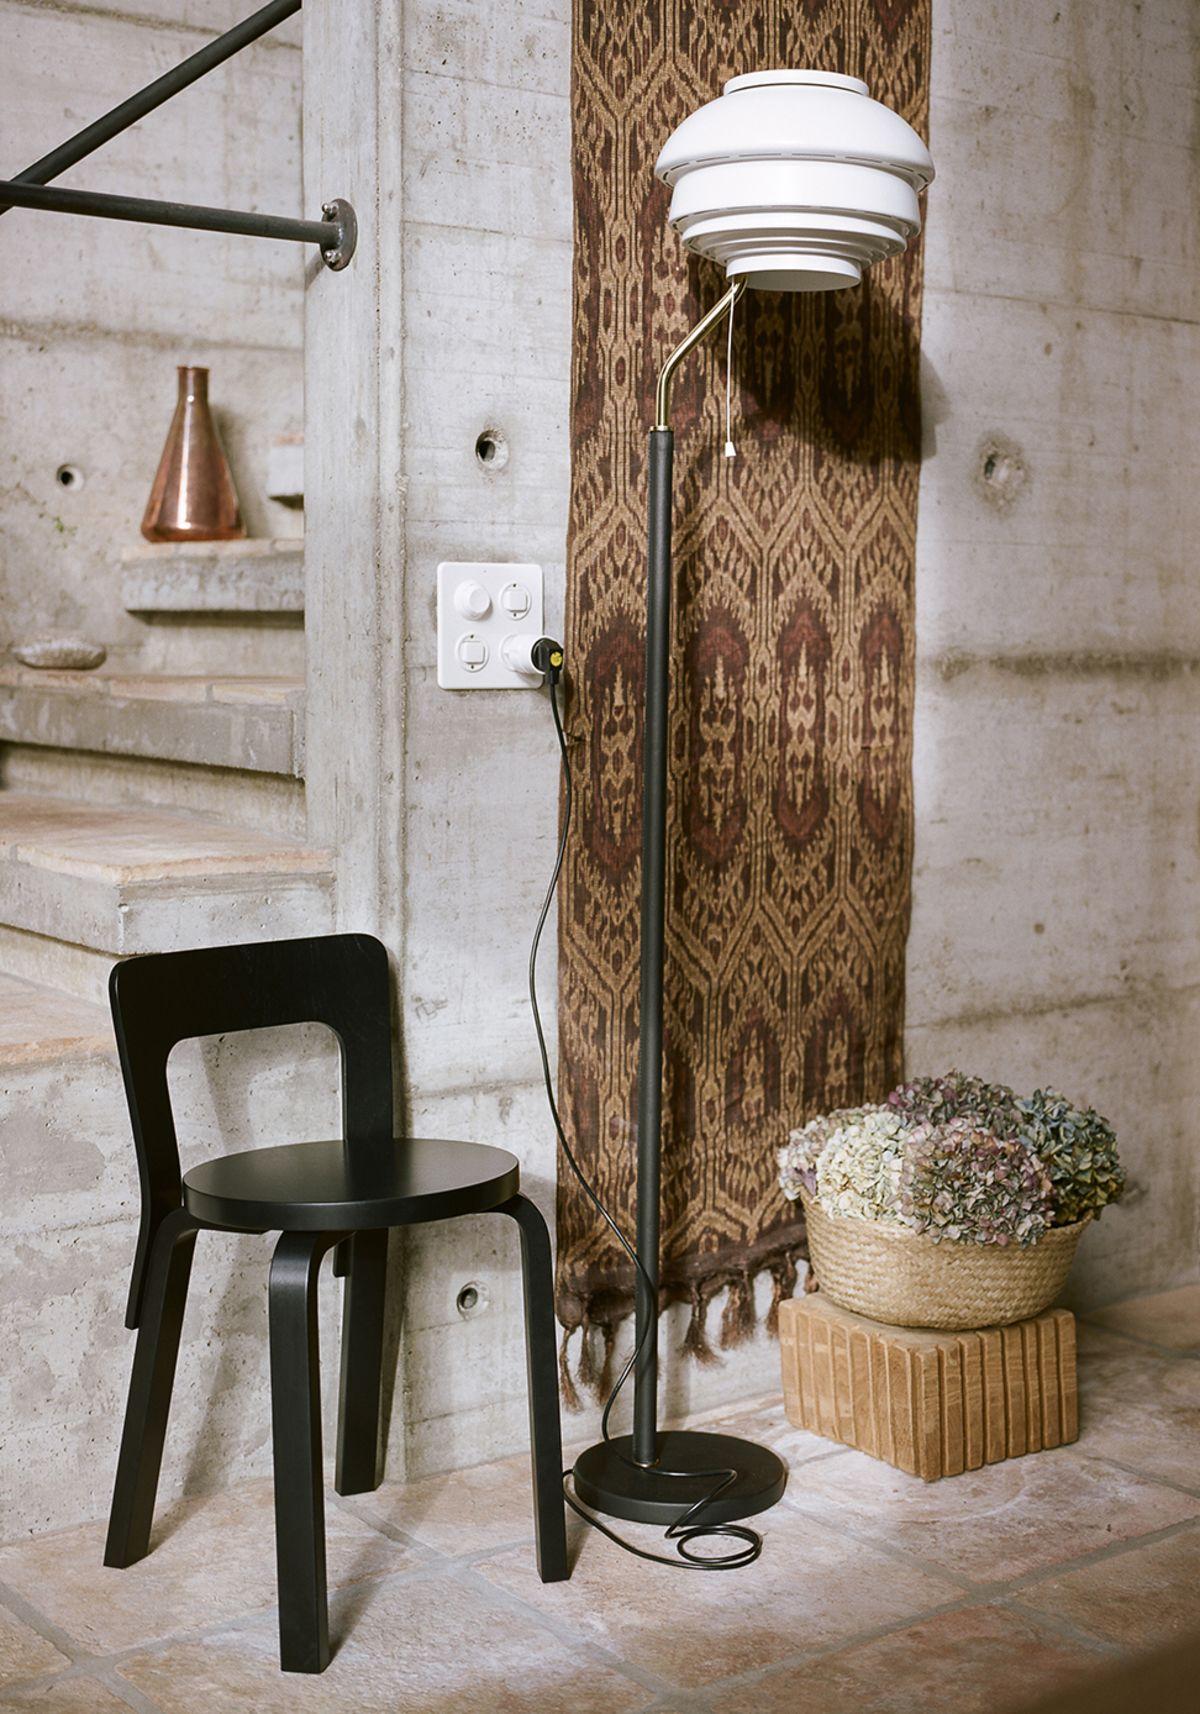 Chair-65-Black-Lacquer-Floor-Light-A808